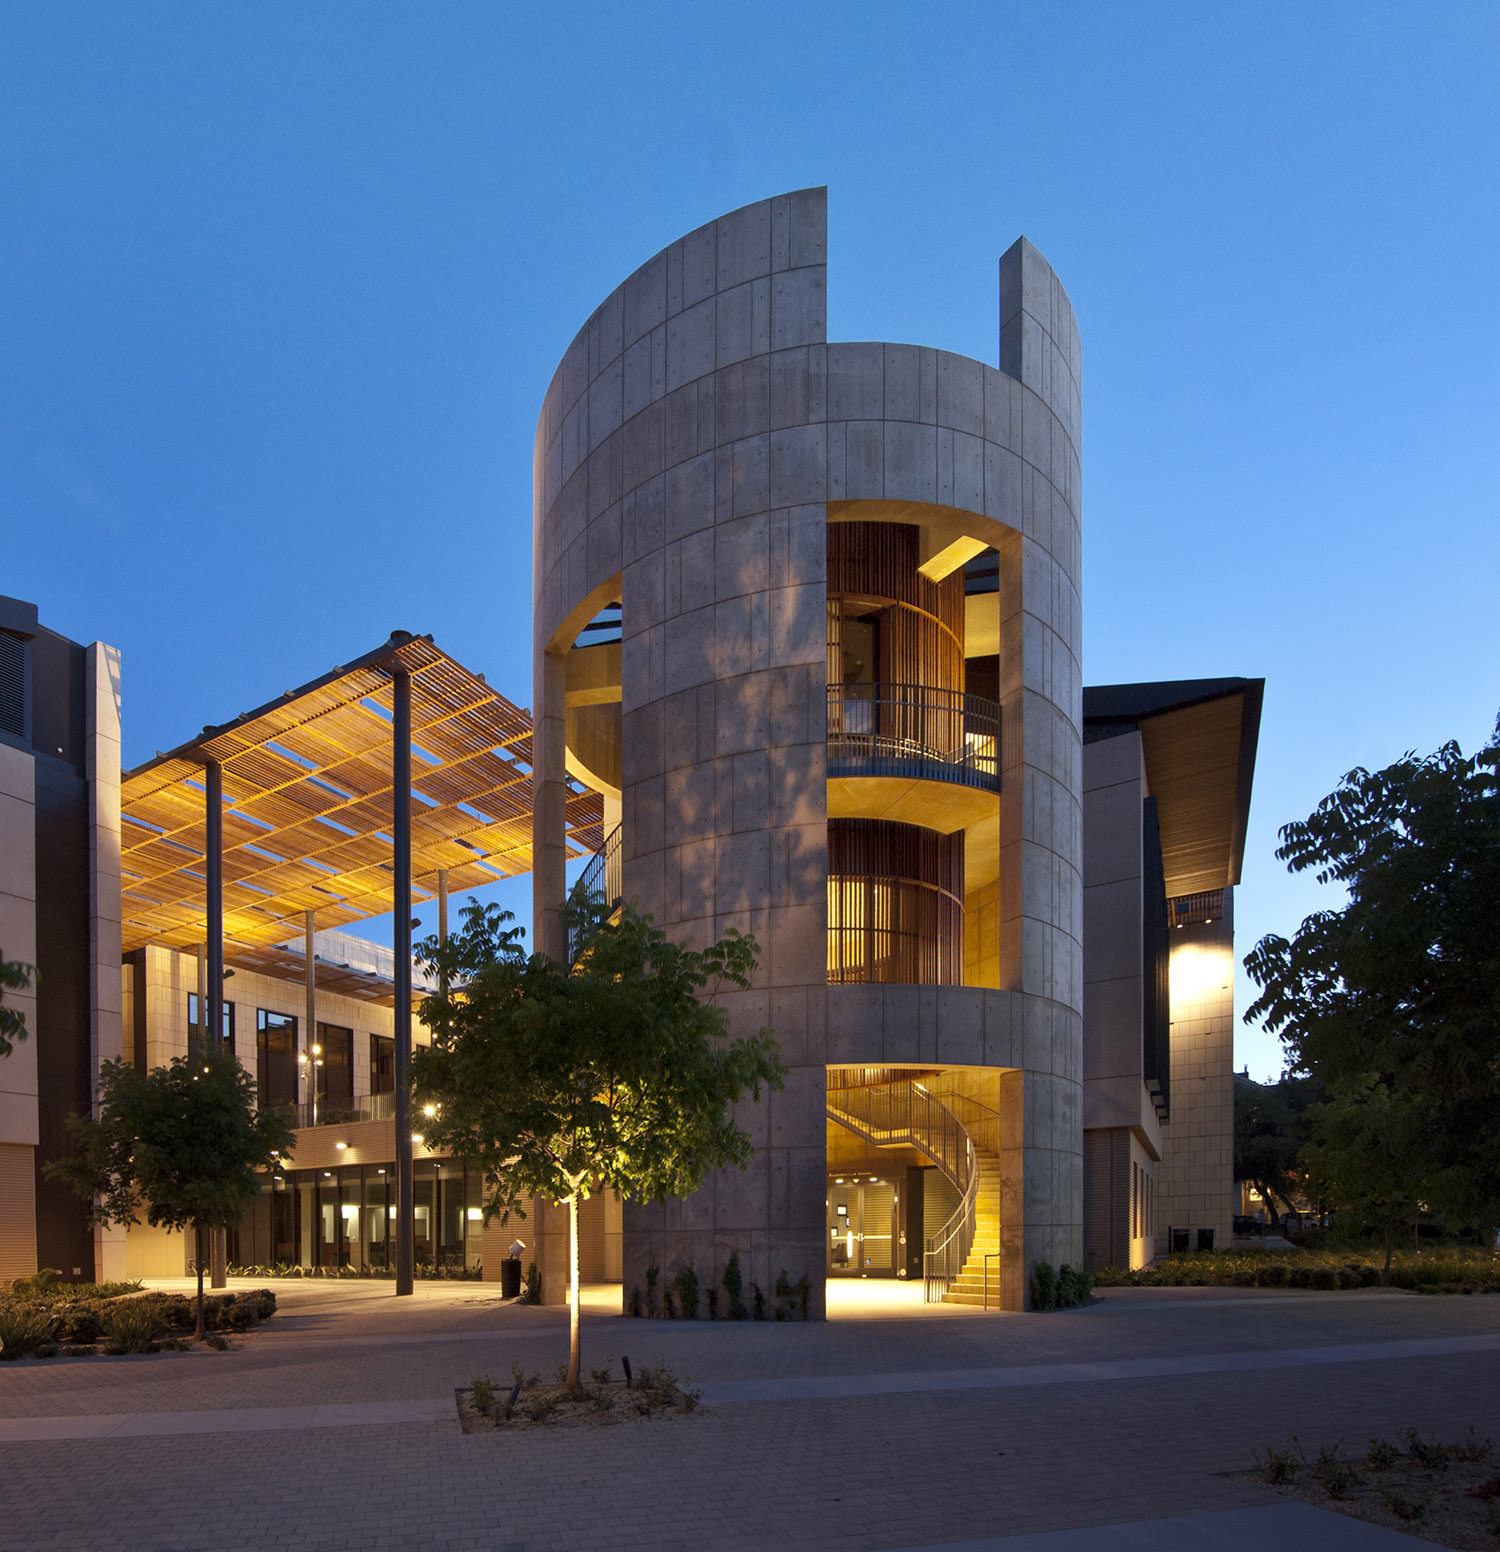 Stanford Law School — Office of Cheryl Barton